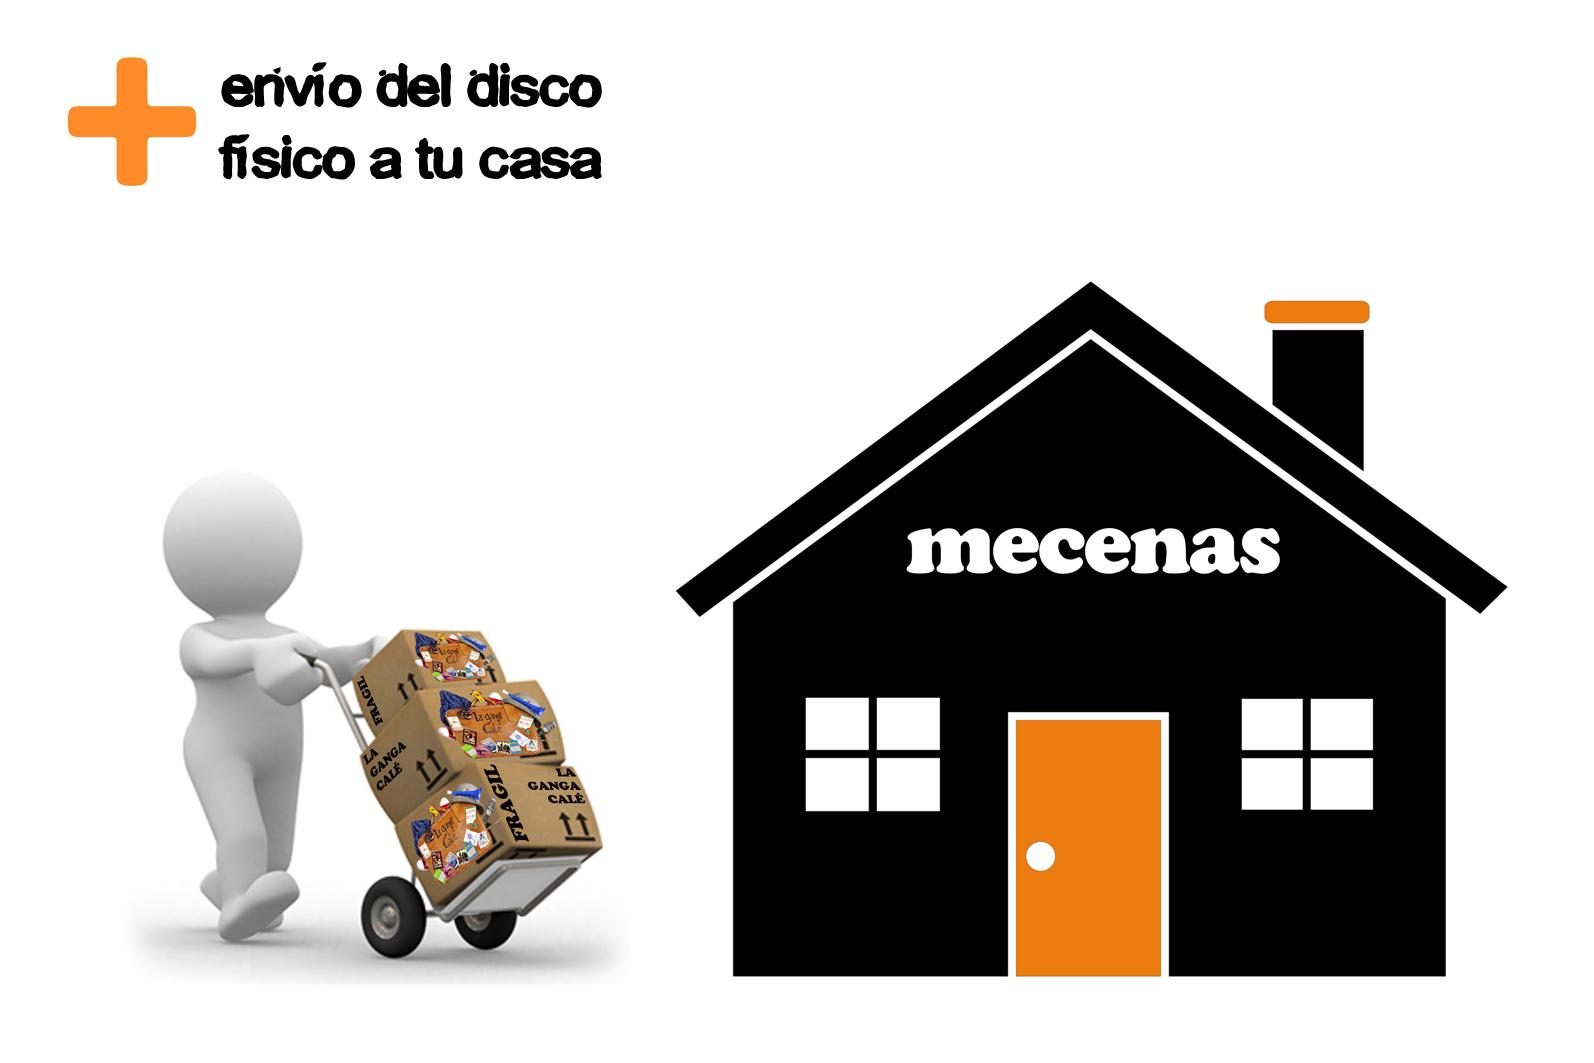 Crowdfunding lagangacal m sica lanzanos - Discoteca in casa ...